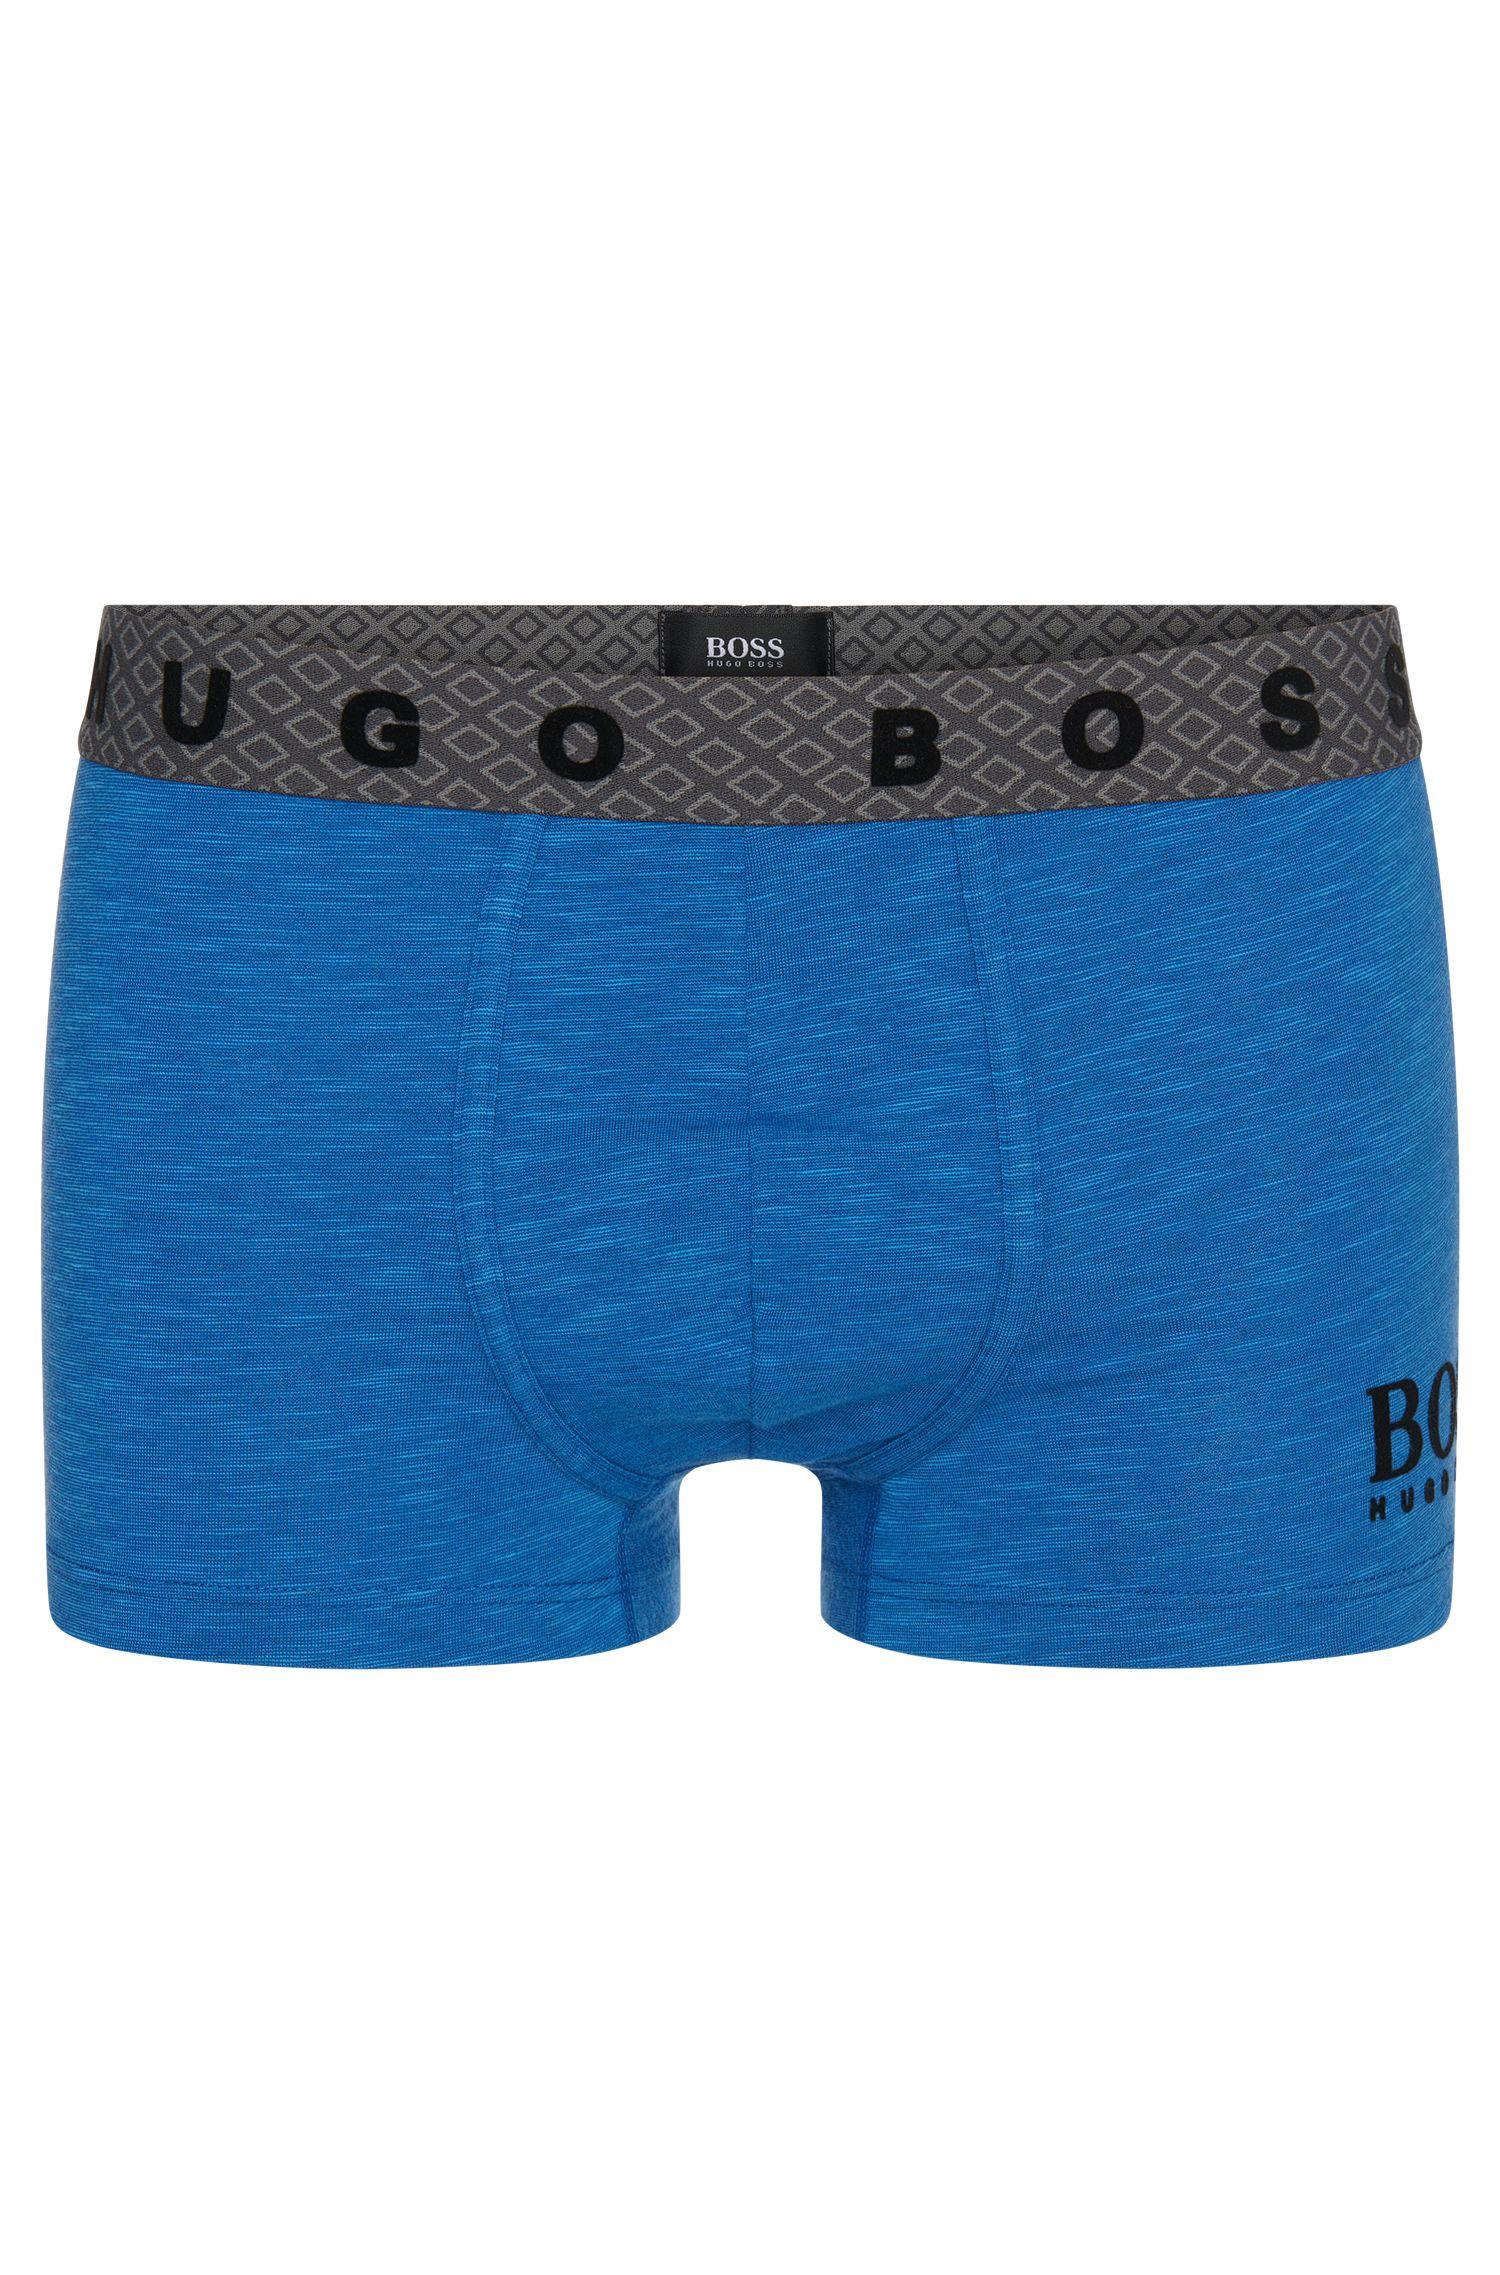 'Boxer Heritage' | Stretch Cotton Logo Boxer Briefs